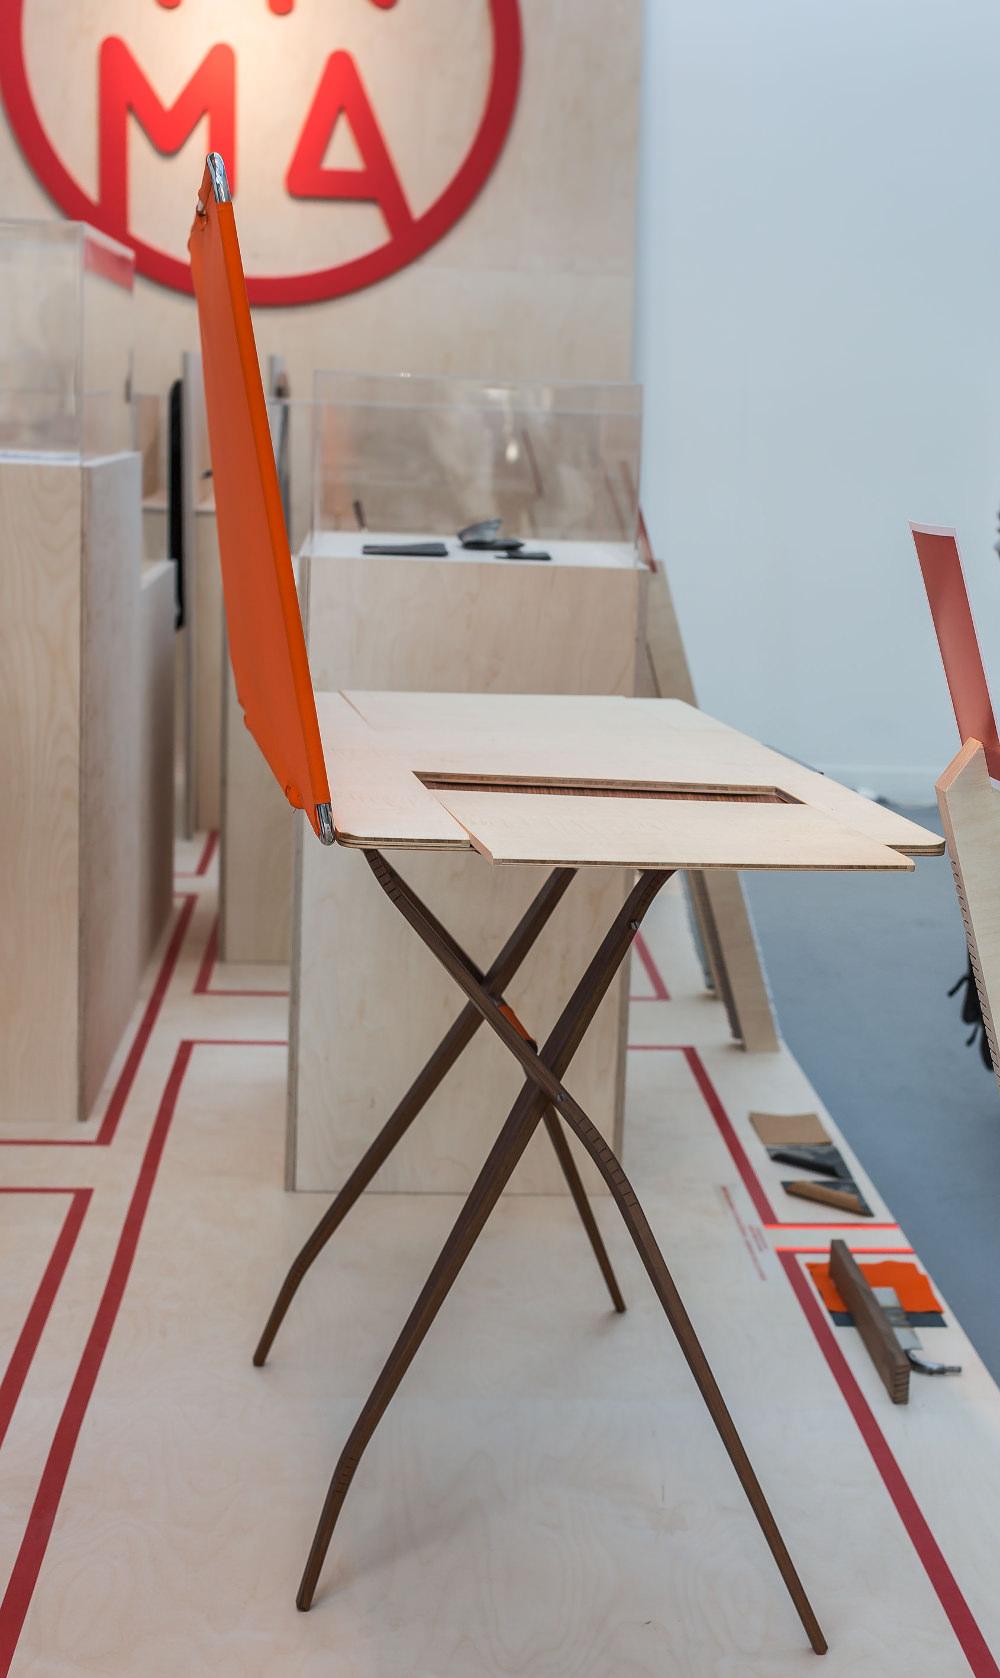 Bureau SLIM par Valentin Debreuil - exposition Hybridation Fertile INMA